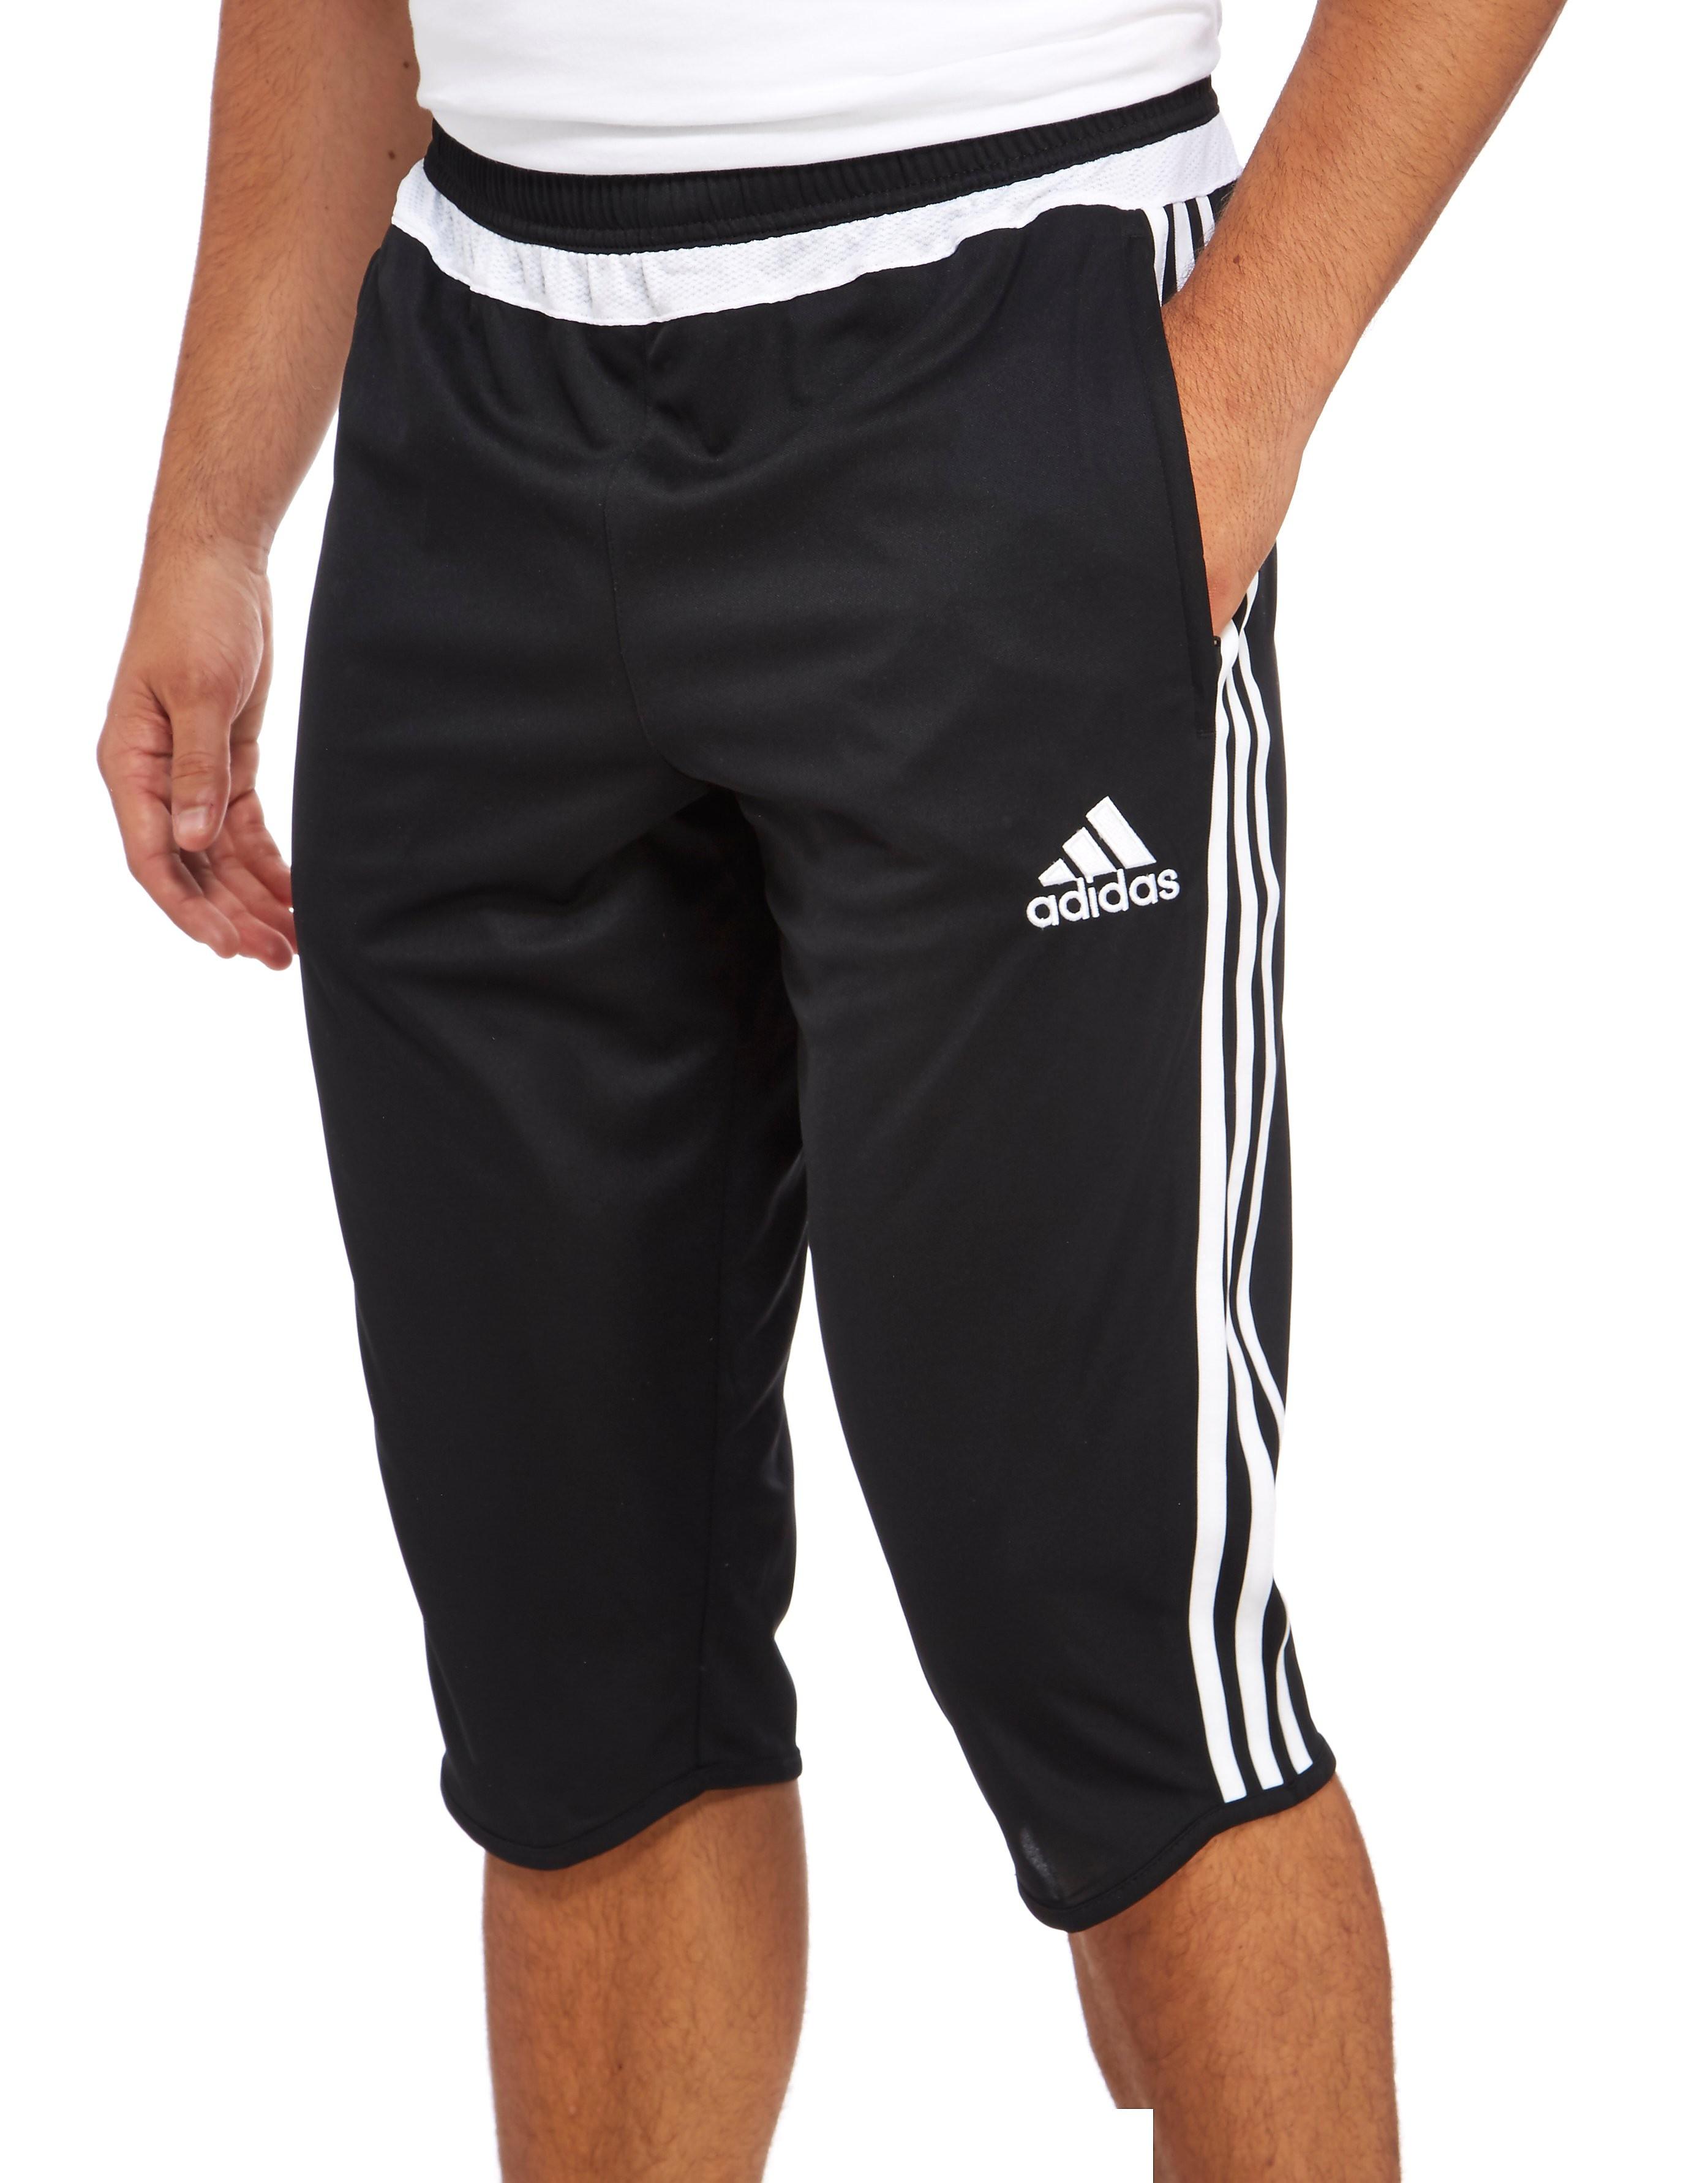 adidas Tiro 15 Poly Three-Quarter Pants